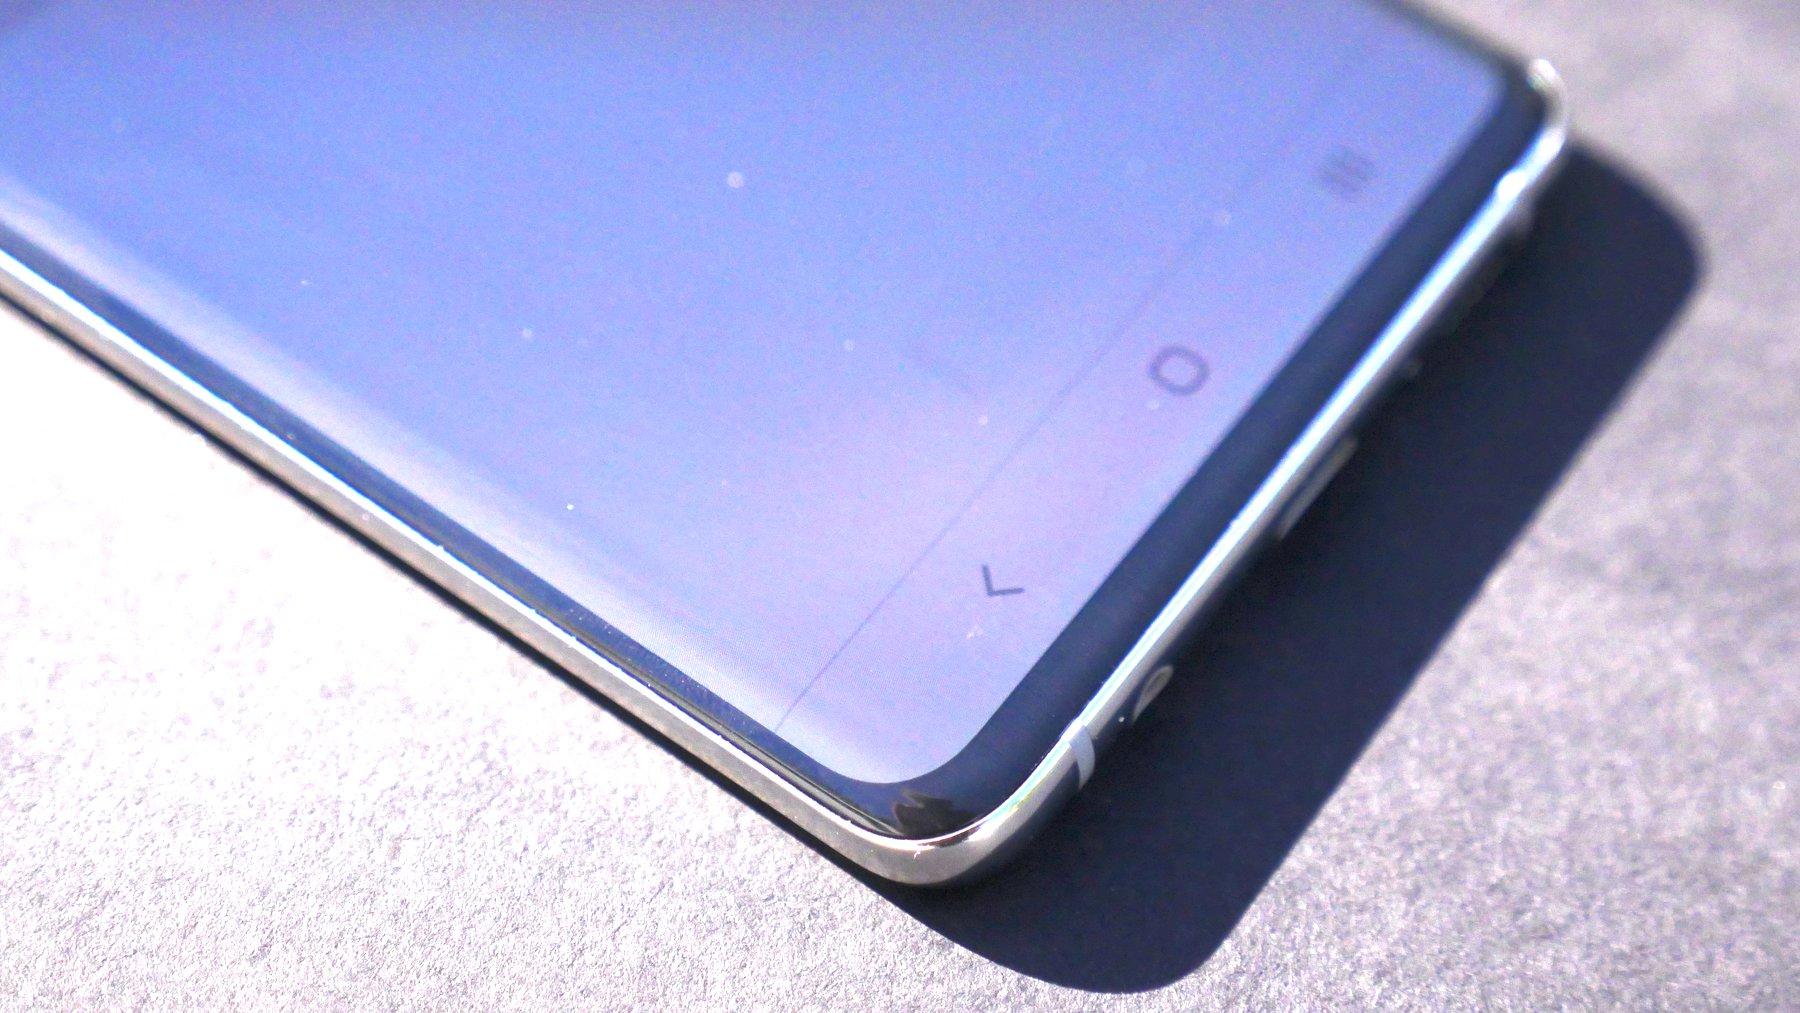 The Samsung Galaxy S10 fingerprint sensor is visible in